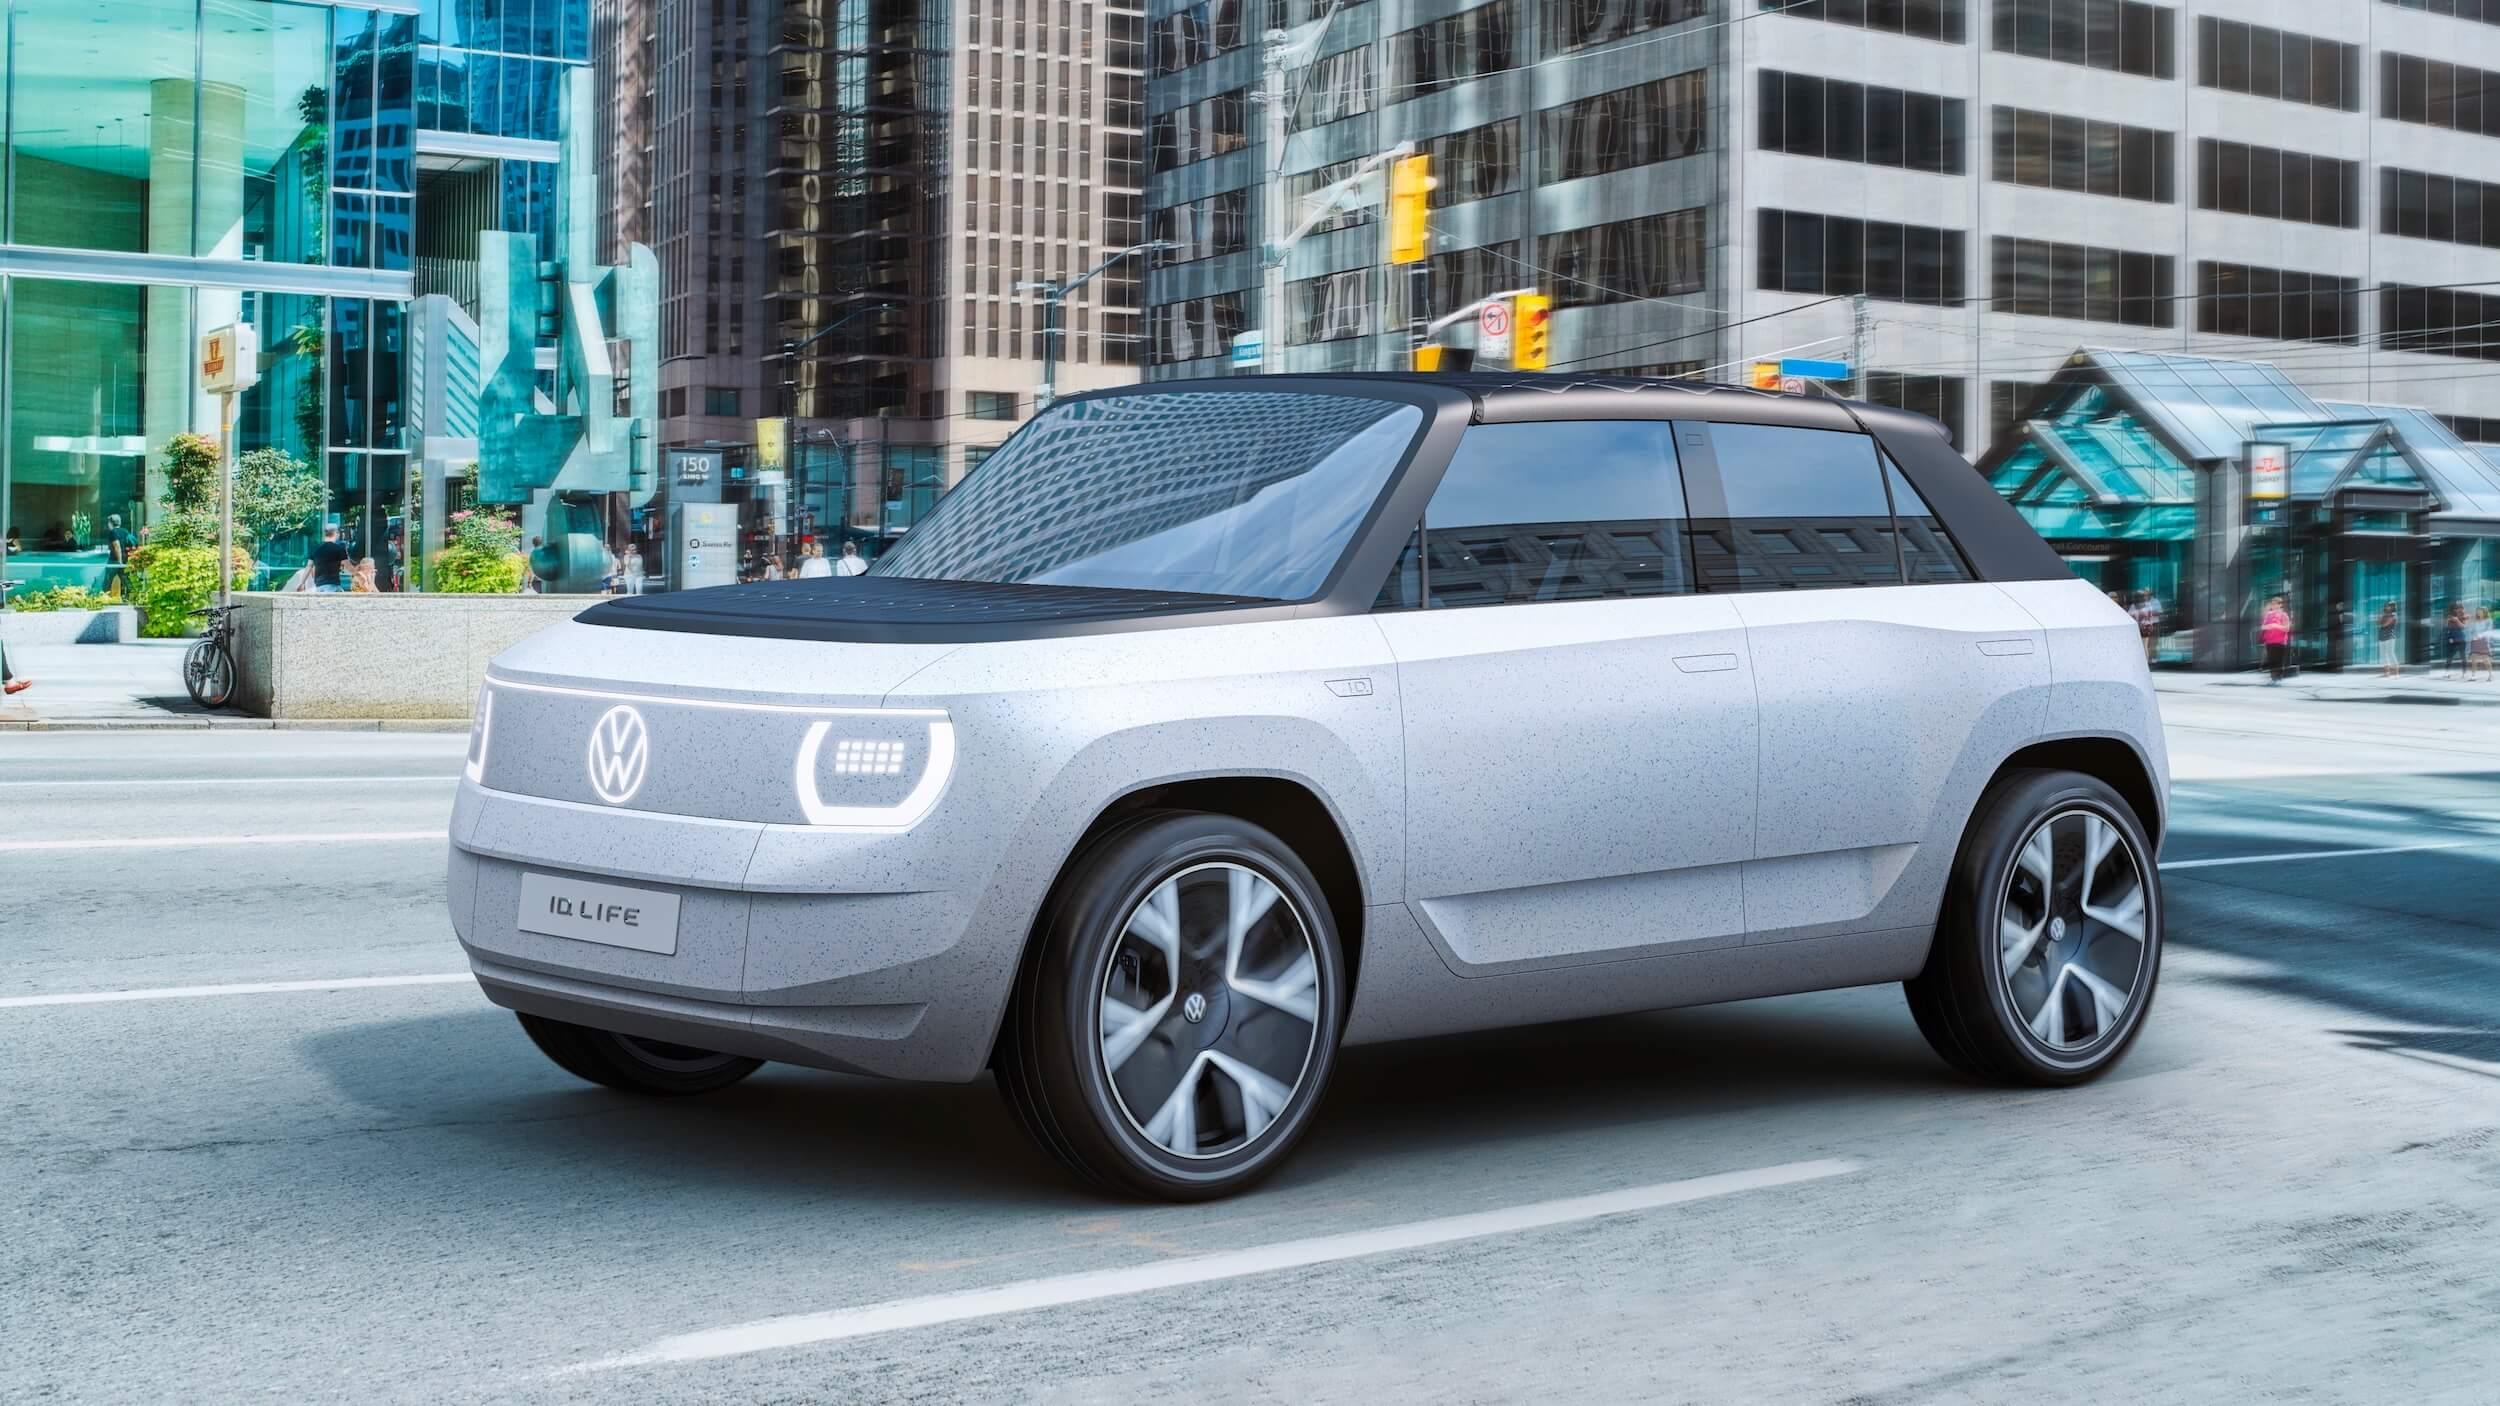 VW ID Life 1